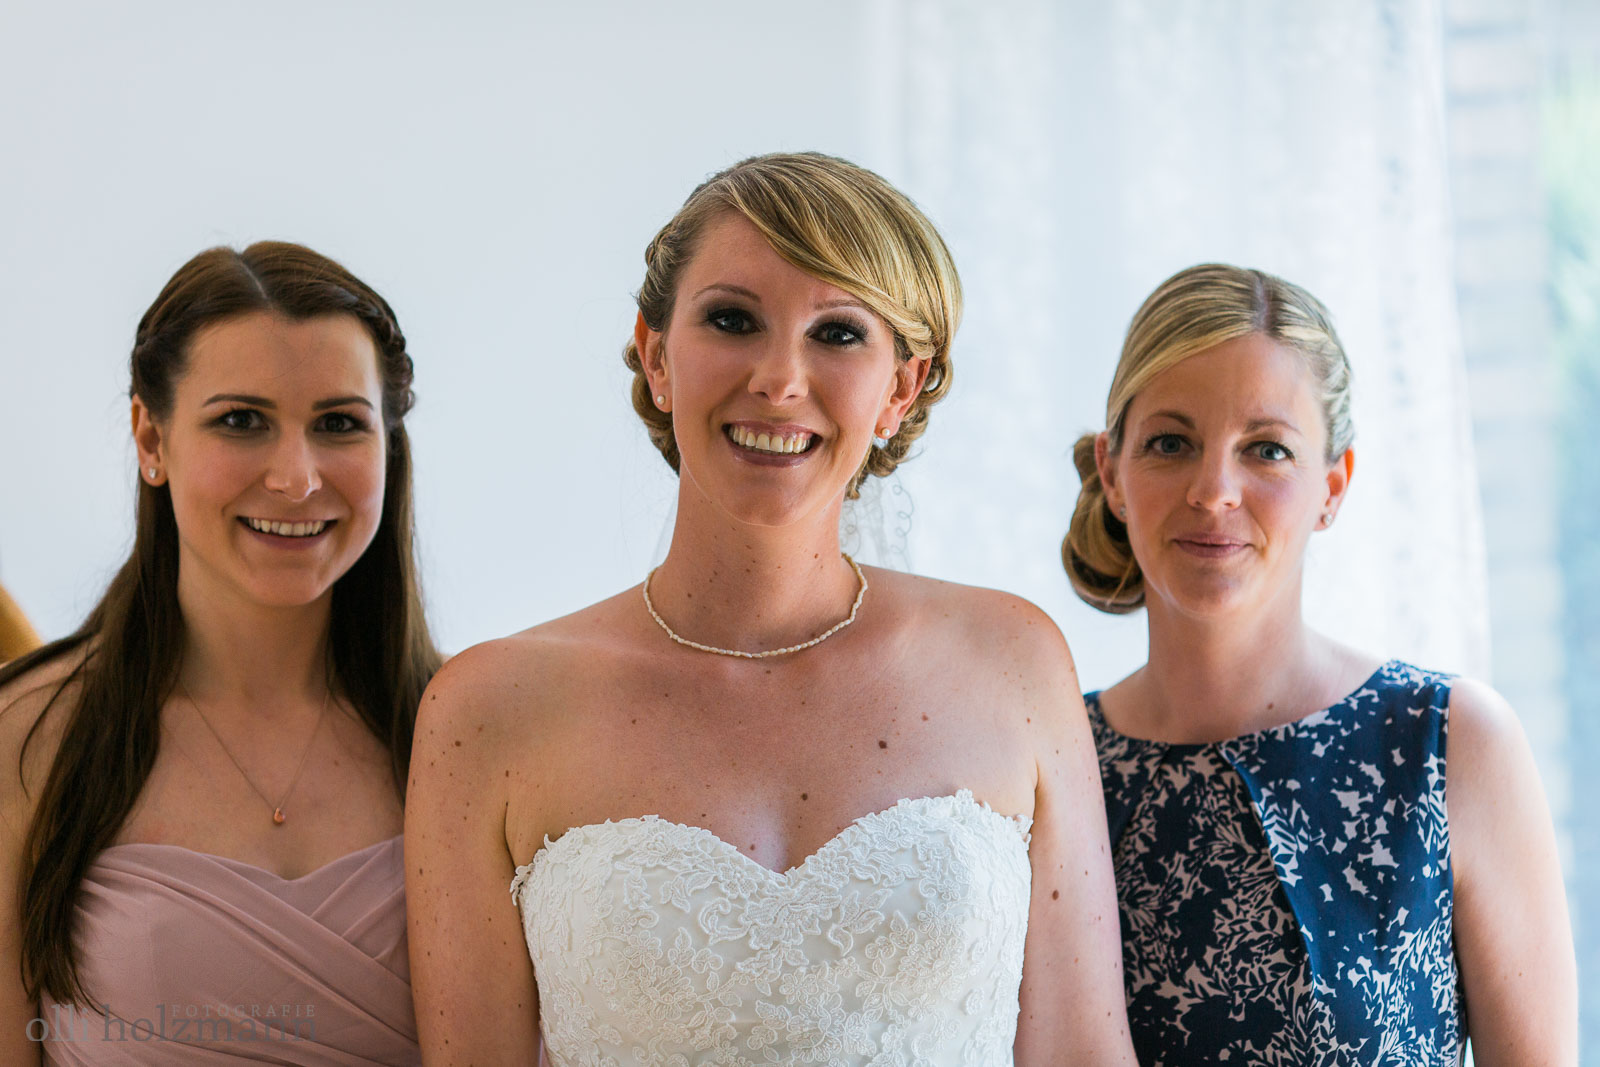 Hochzeitsfotograf nrw-31.jpg